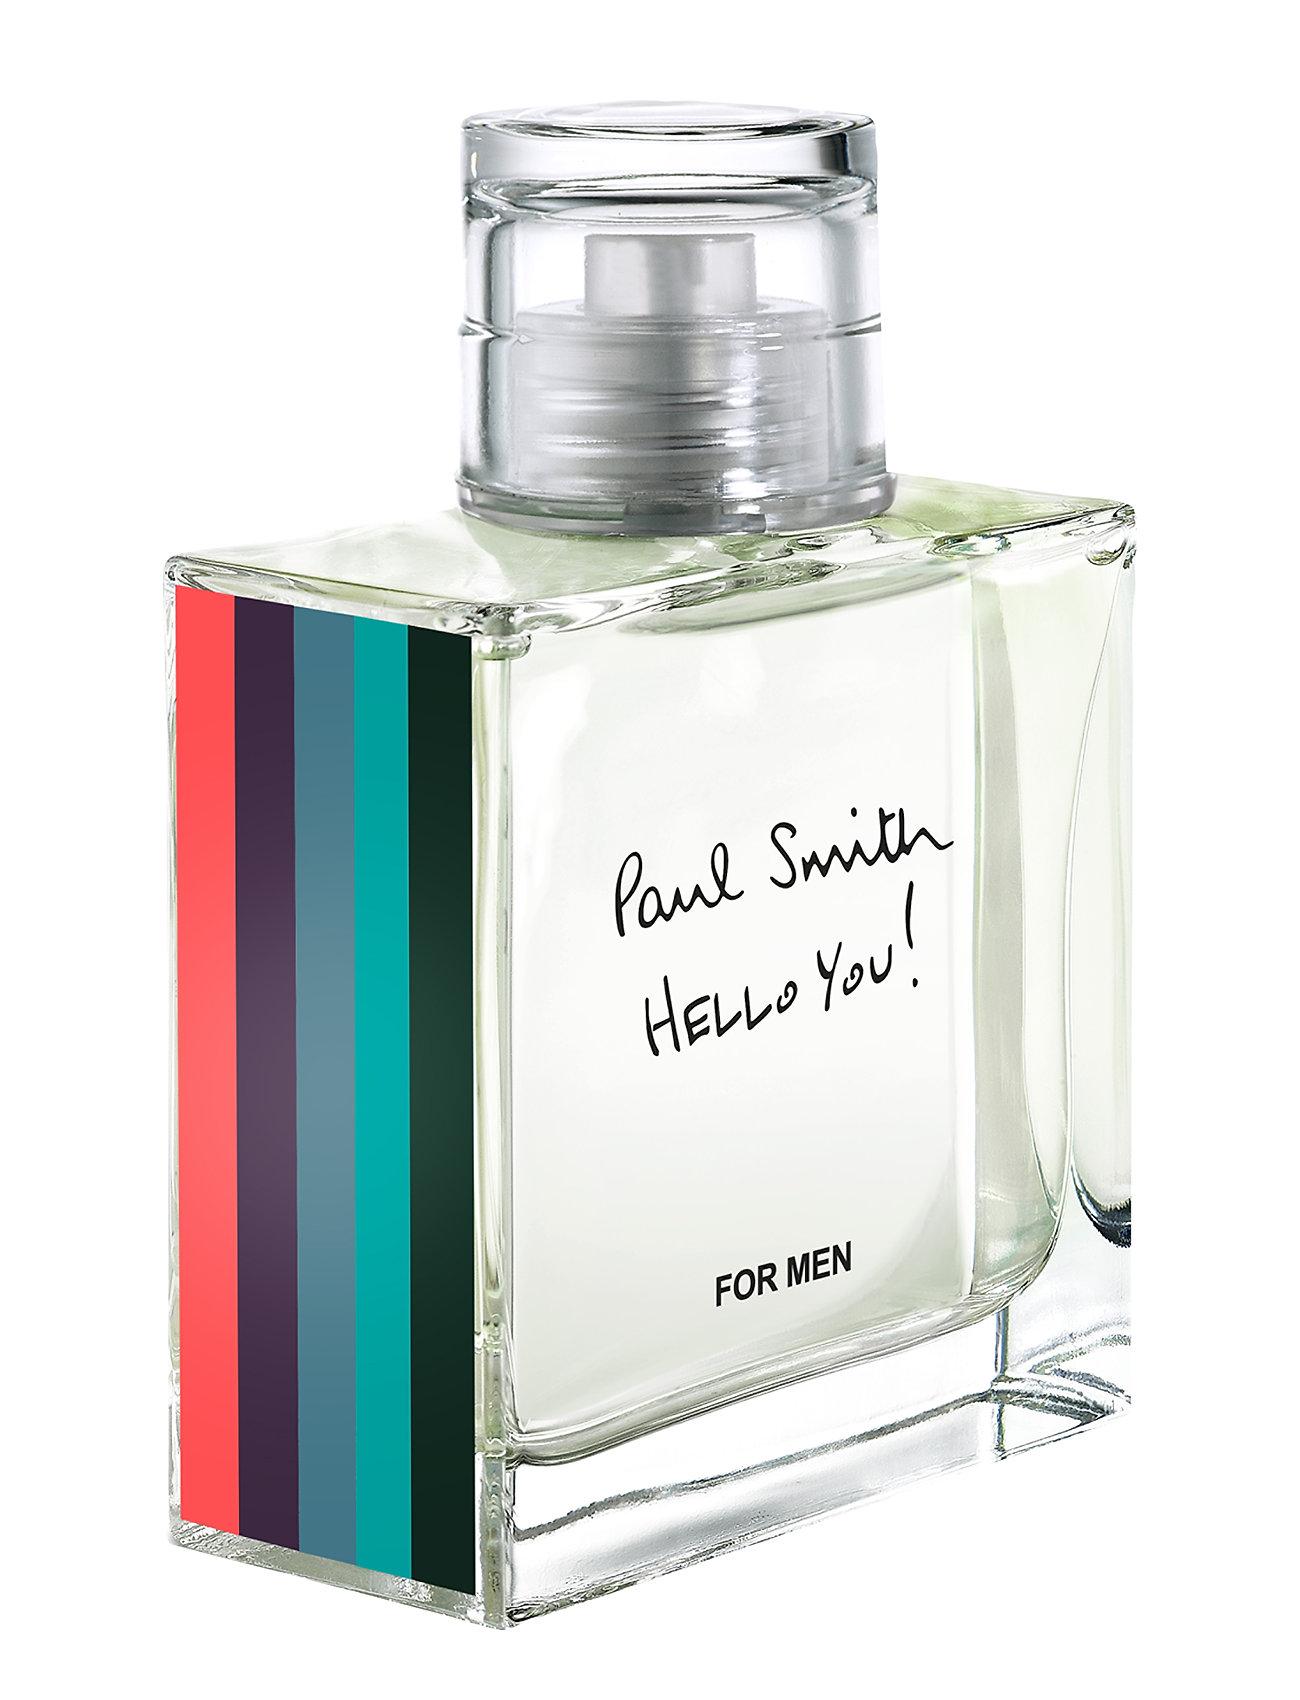 Paul Smith Hello You - CLEAR